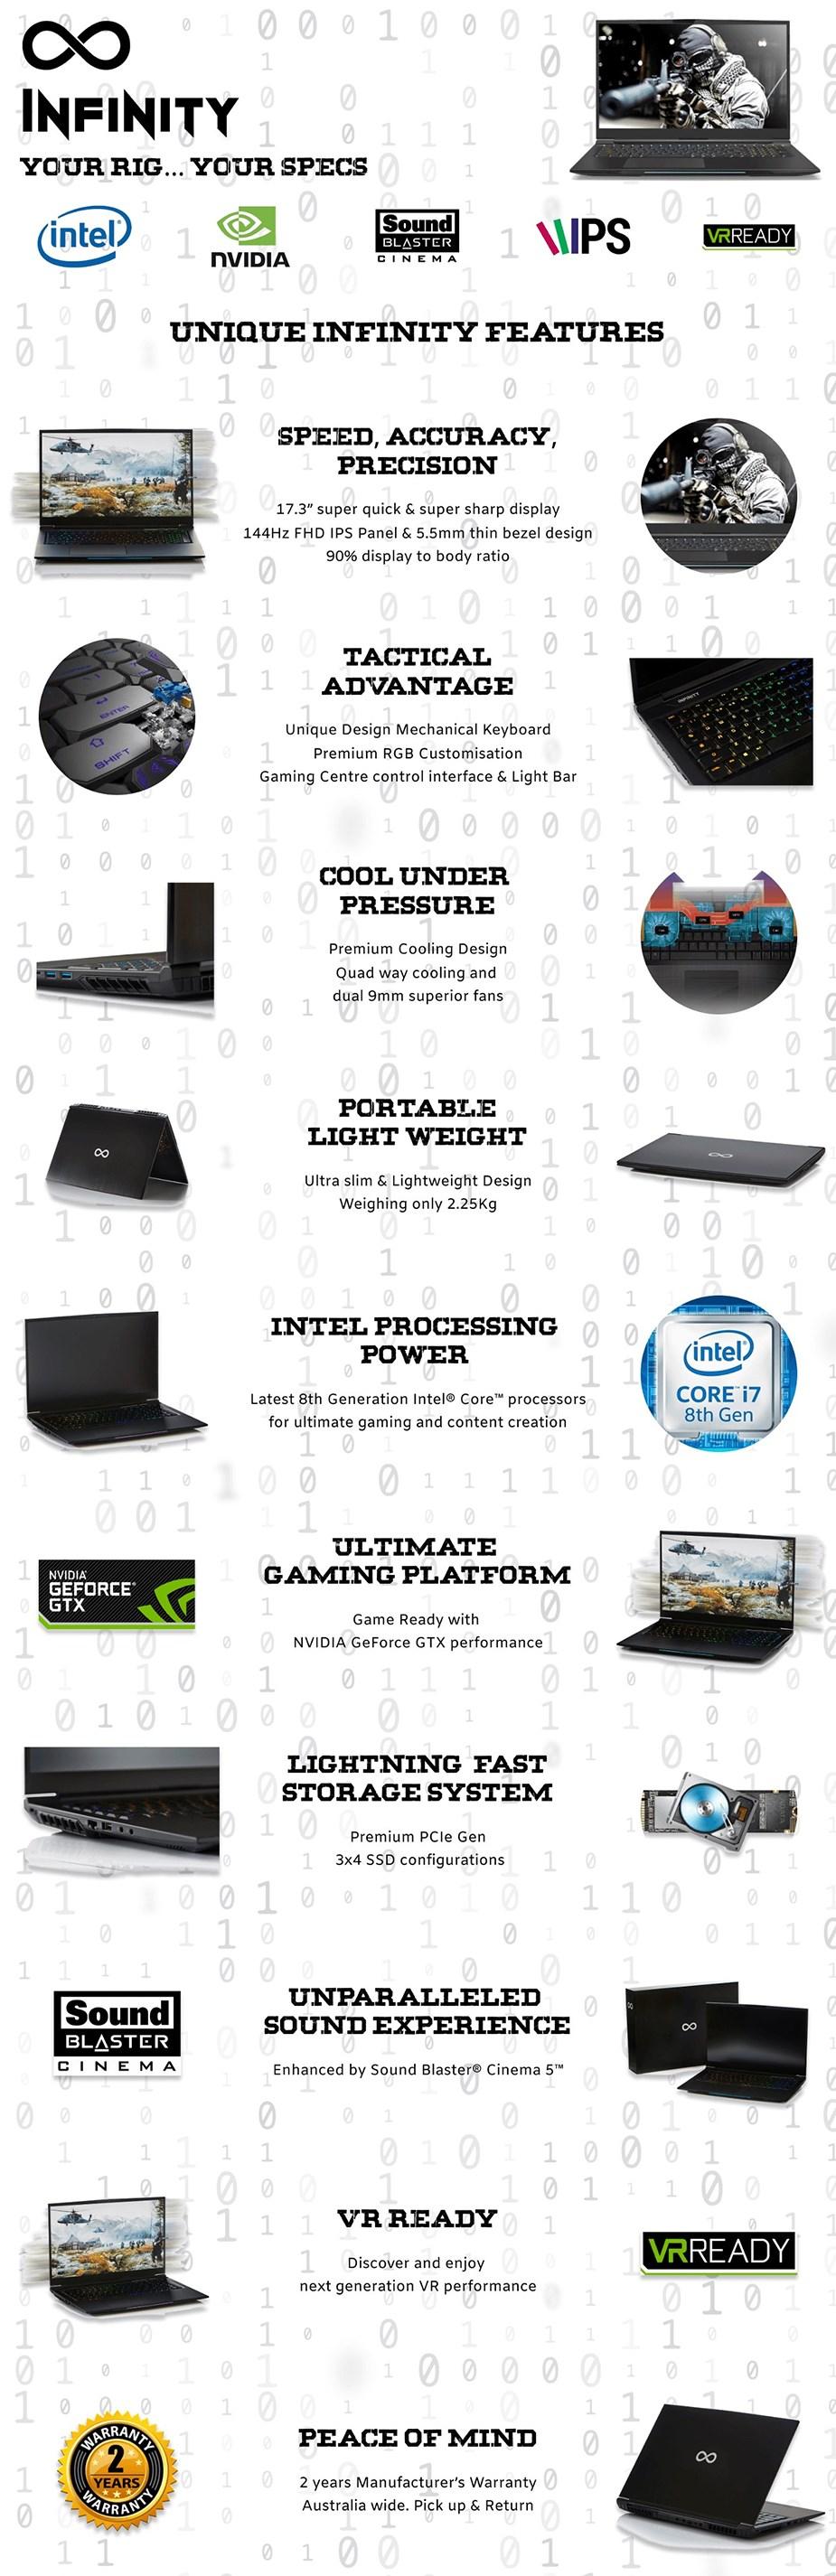 "Infinity S2070-B01 17.3"" 144Hz Gaming Laptop i7-8750H 16GB 512GB+1TB RTX2070 W10 - Desktop Overview 1"